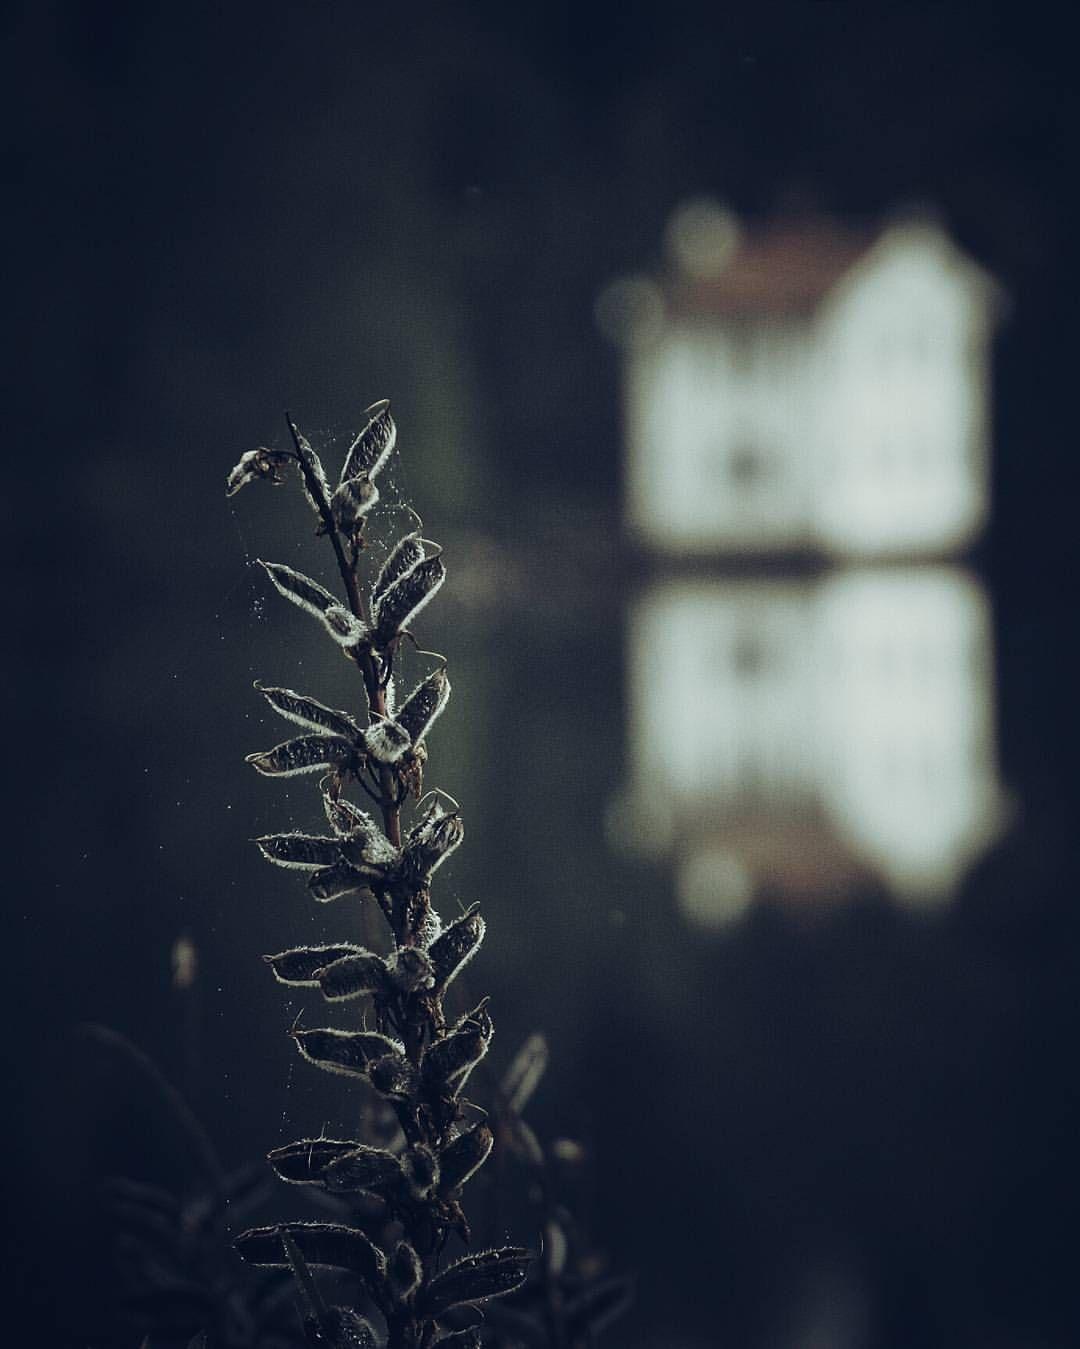 Det gamla badhuset... fast på ett litet annat sätt. ❤ ◇◇◇◇◇◇◇◇◇◇◇◇◇◇◇◇◇◇◇◇◇◇◇◇◇◇◇◇◇◇◇◇◇◇◇◇◇◇◇ #visitsweden #ig_sweden #rsa_naturepics #Sweden #swedenimages #fingerprintofgod #instadalarna #royalsnappingartists #sombrescapes #igshotz #incredible_shot #artofvisuals #superb_photos #main_vision #moodygrams #agameoftones #vzcomood #ourplanetdaily #tv_allnature #4xn #tv_foggy #folkcreative #mist_vision #earth_shotz #wowplanet #ourmoodydays #igbest_shotz #aov #ig_masterpiece @instagram @instagood…